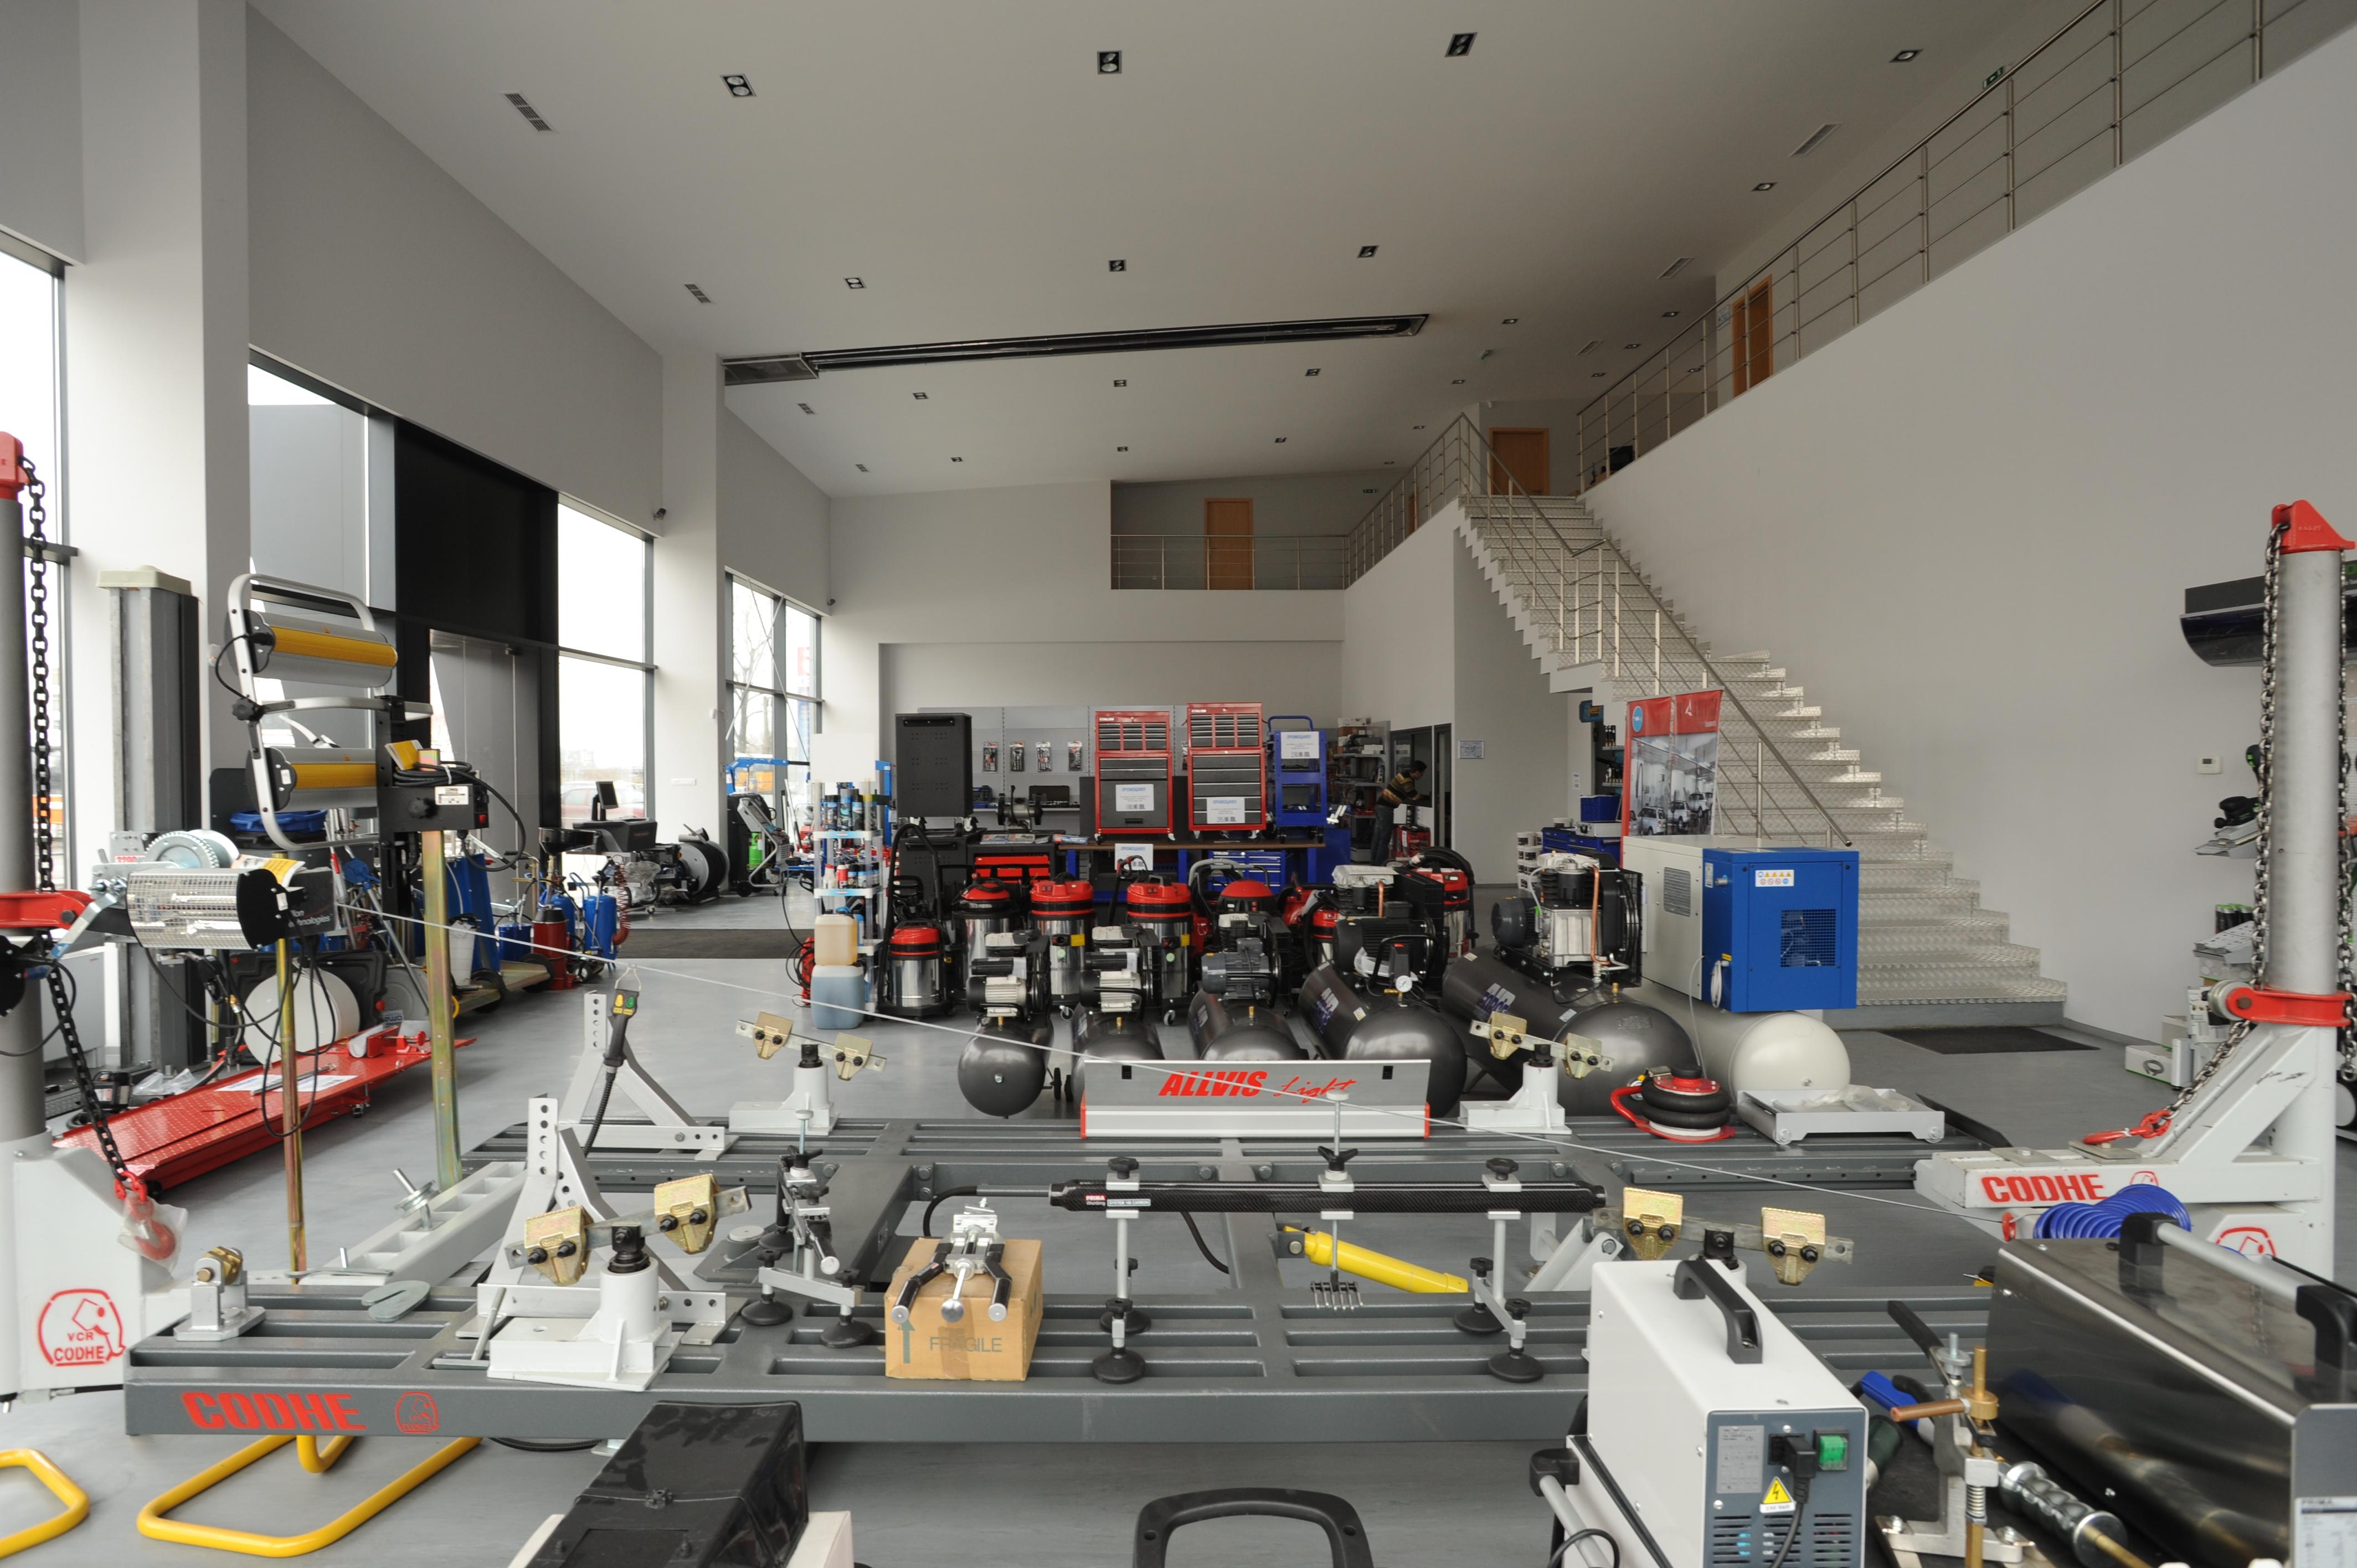 http://niteh.com/showroom/DSC_0185.JPG